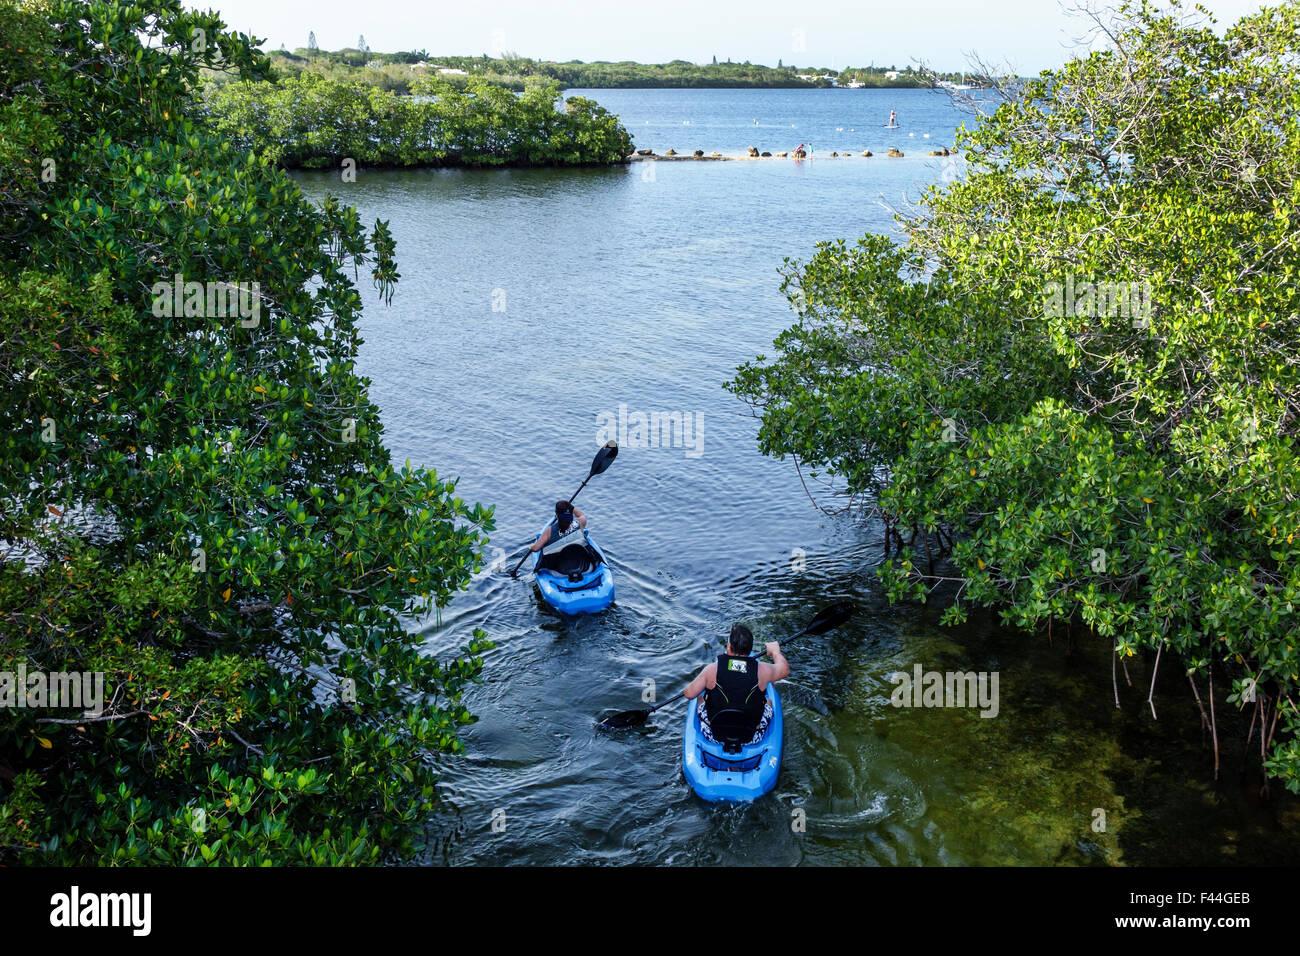 Florida, FL, South, Keys, highway Route 1 Overseas Highway, Key Largo, John Pennekamp Coral Reef State Park, Largo Stock Photo